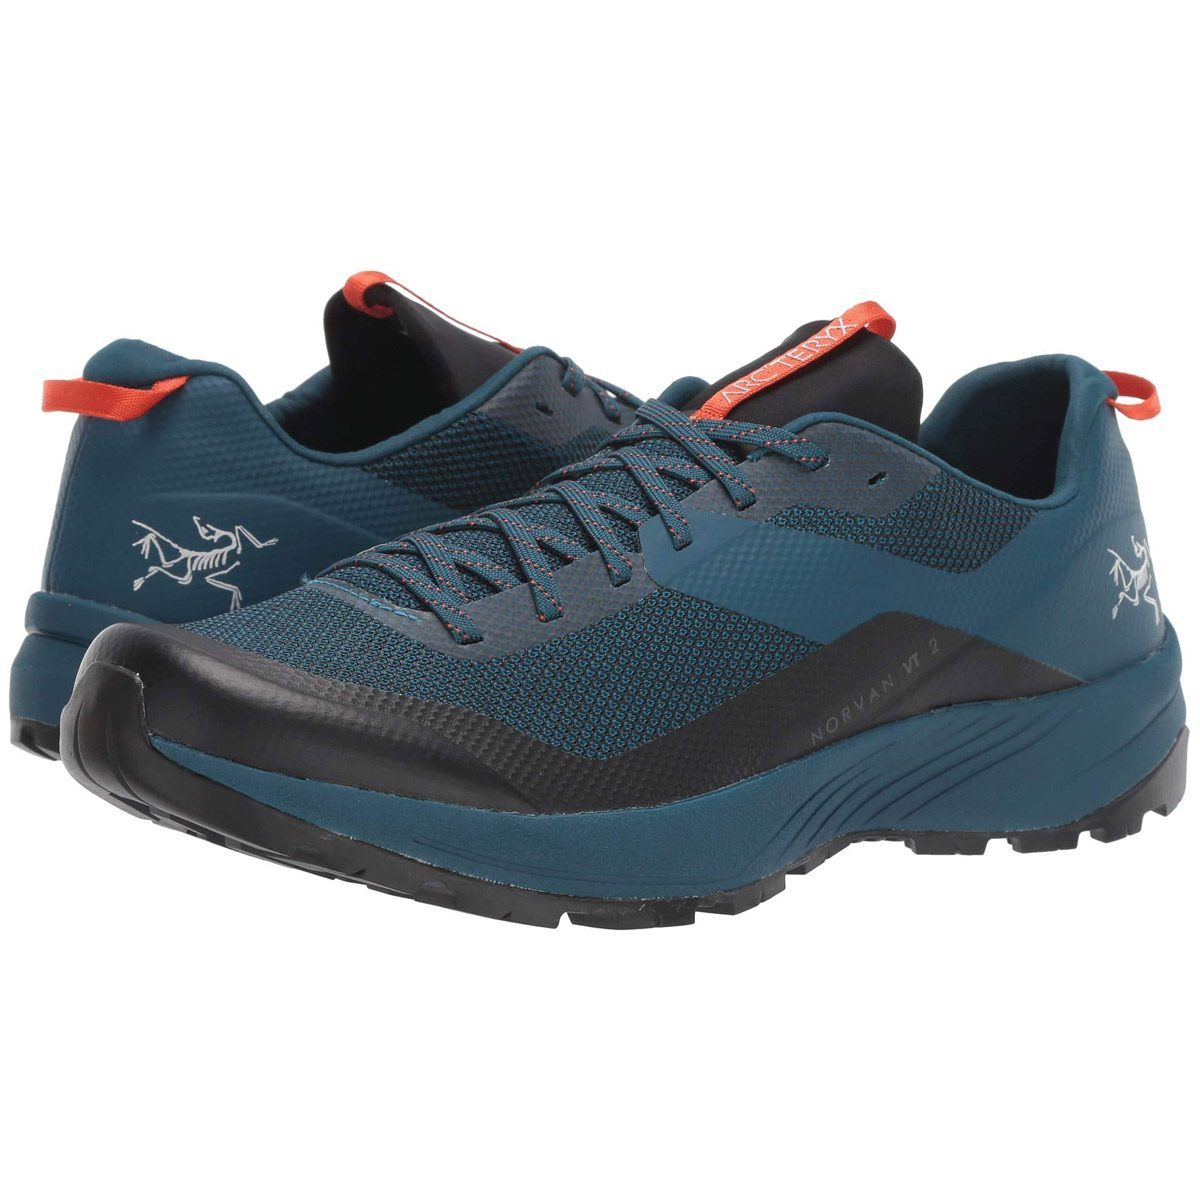 Arc'teryx Norvan VT 2 hiking shoes